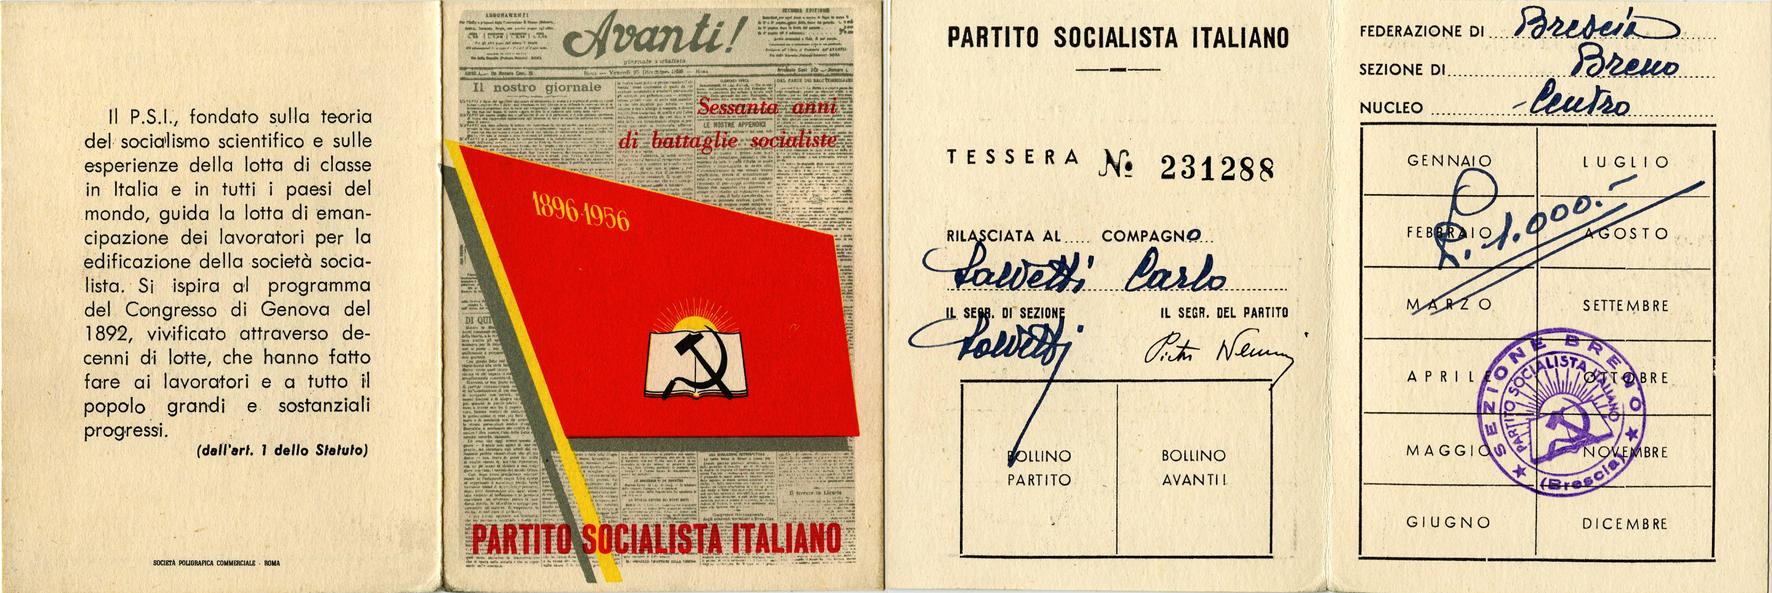 tessera 1956